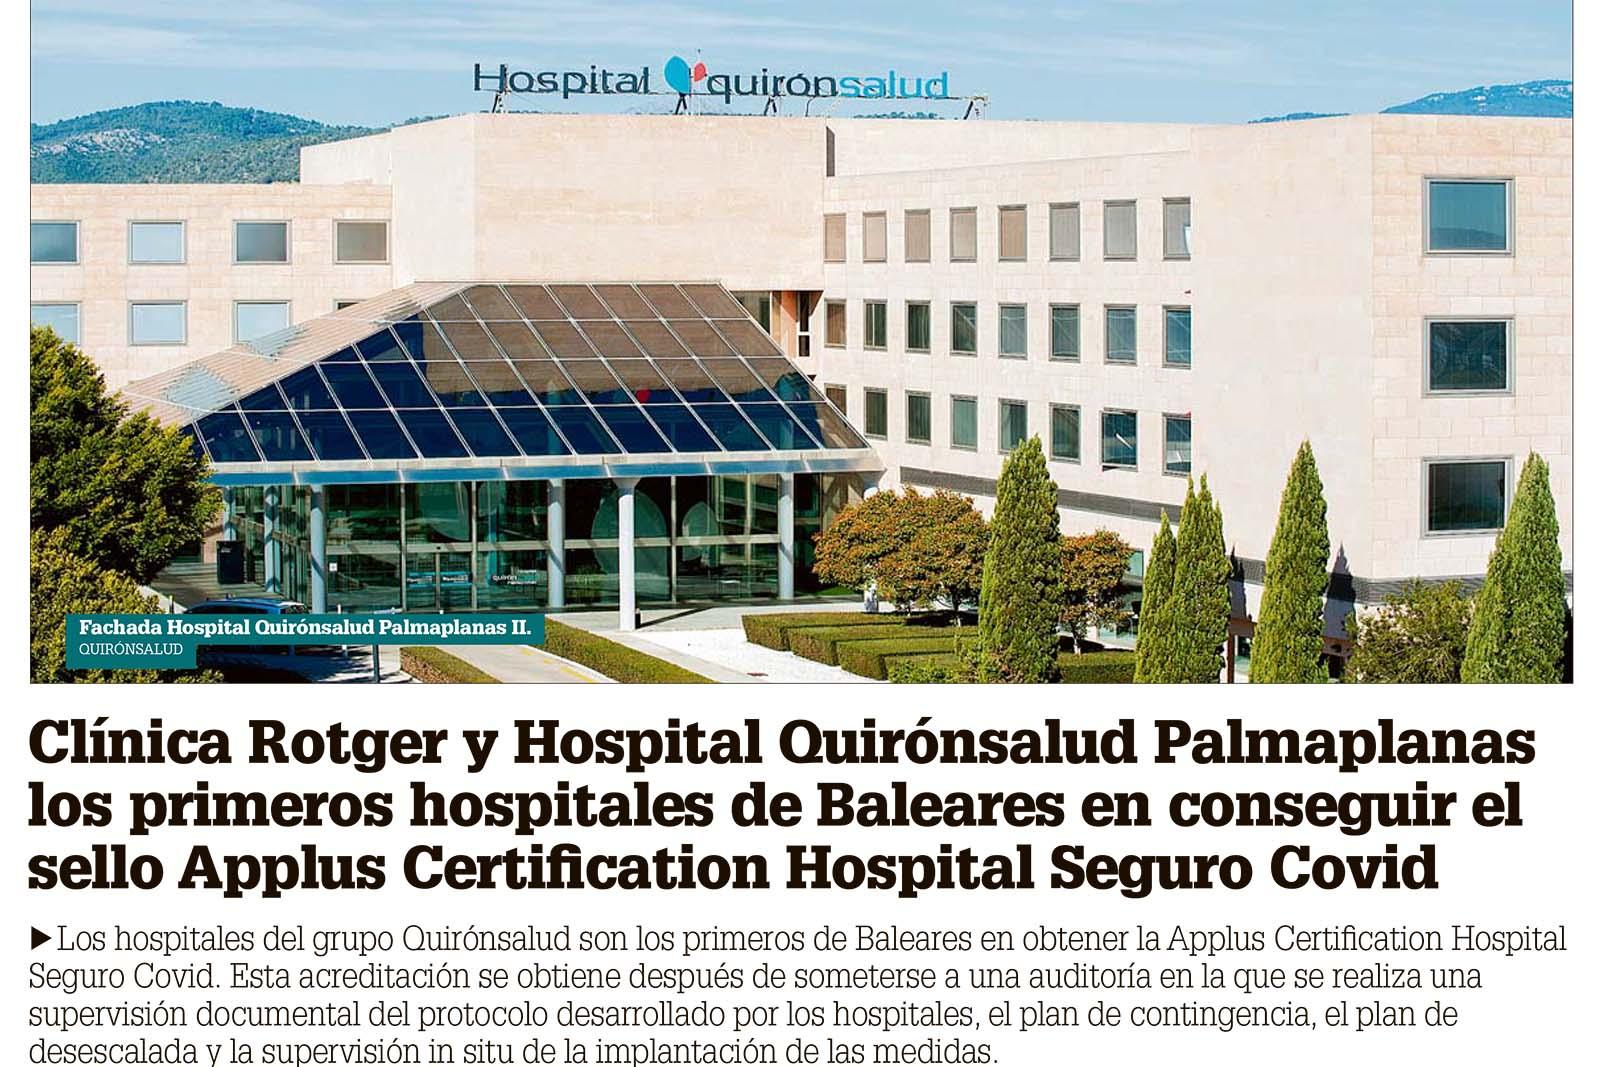 DM-Applus-Certification-Hospital-Seguro-Covid